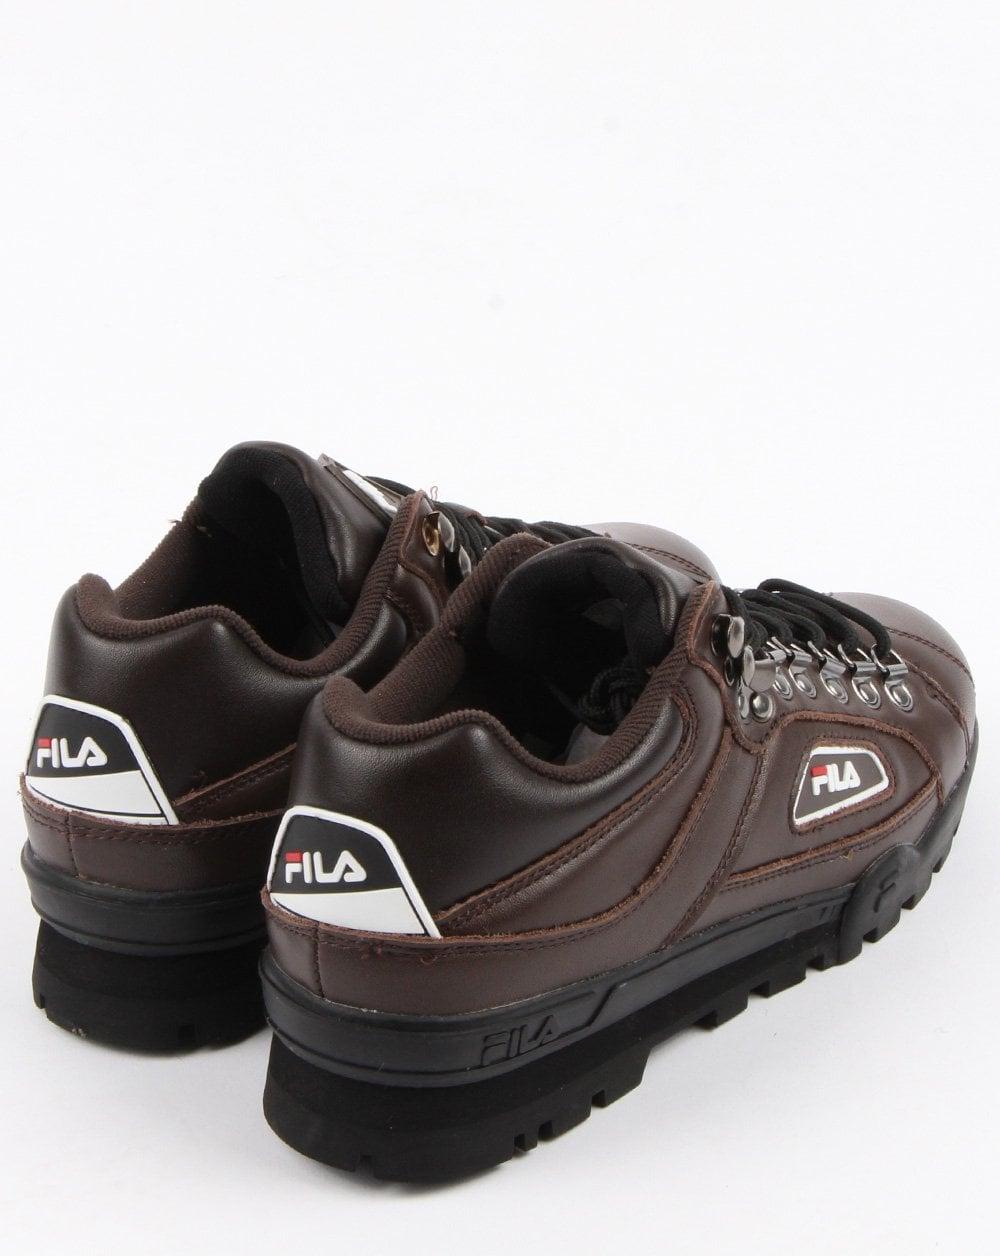 Fila Vintage Trailblazer Boots Brown,leather,hiking,Pinecone